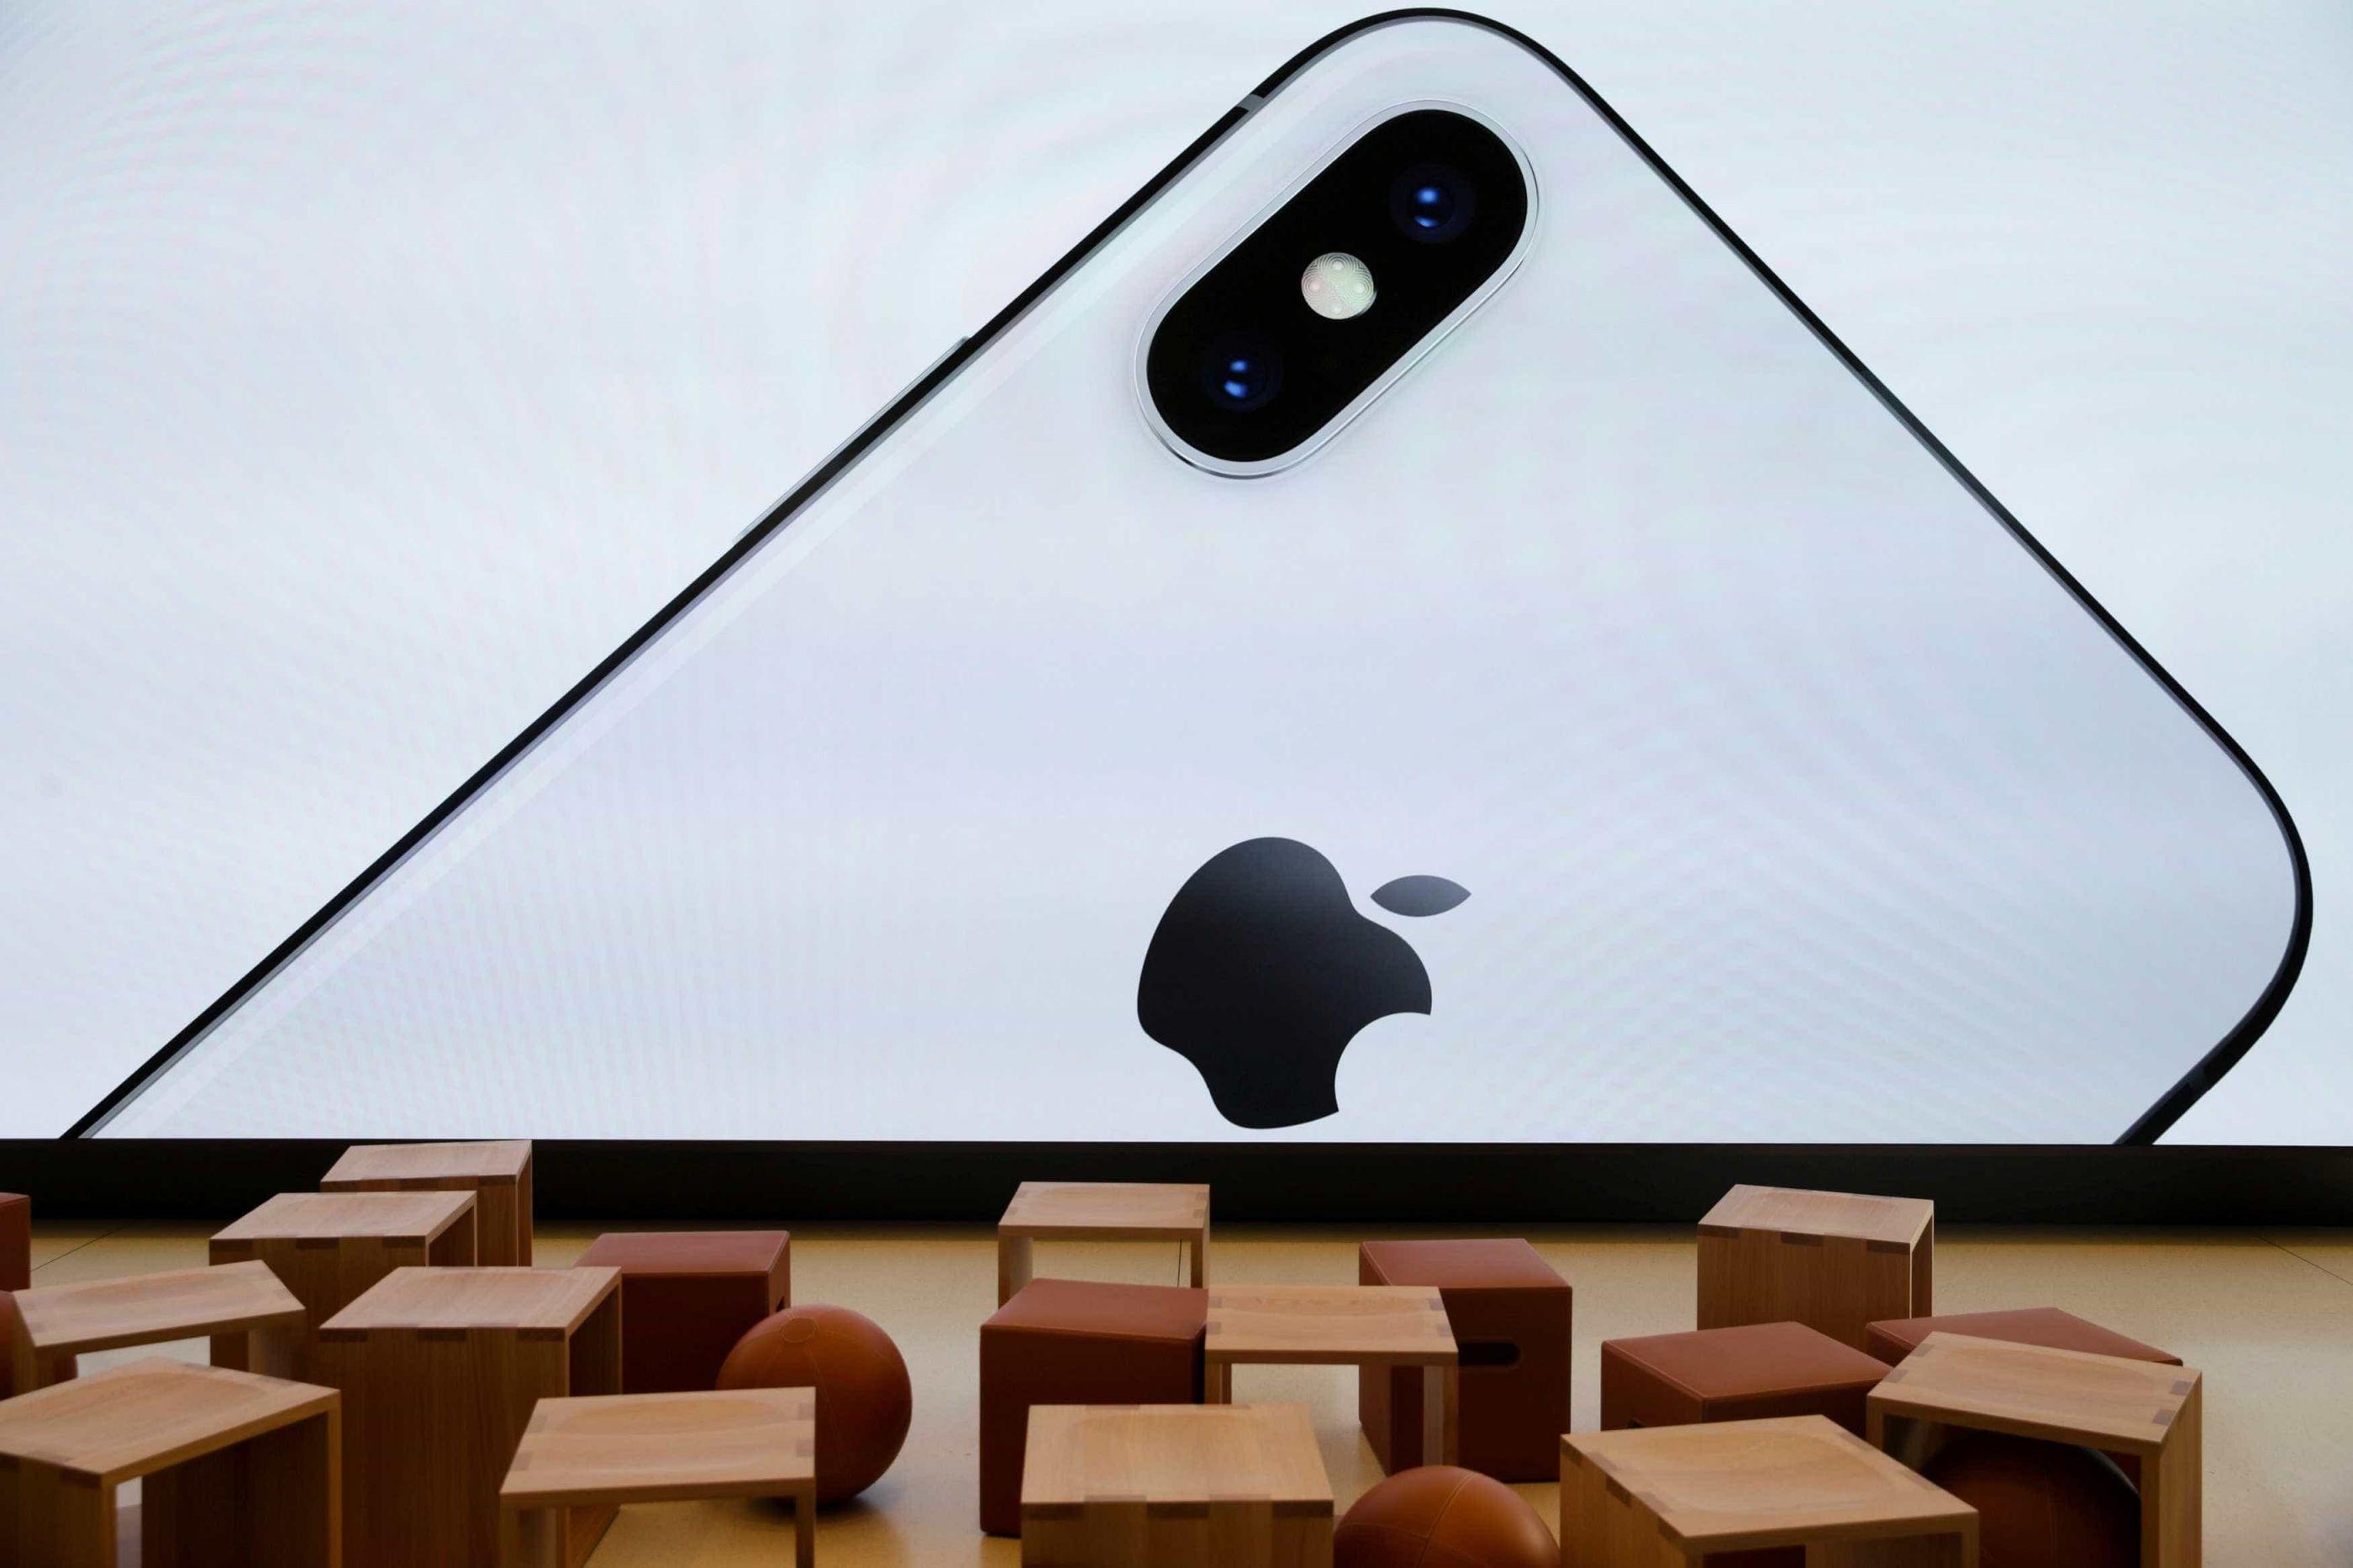 Hackers usam protótipos da Apple para invadir iPhones